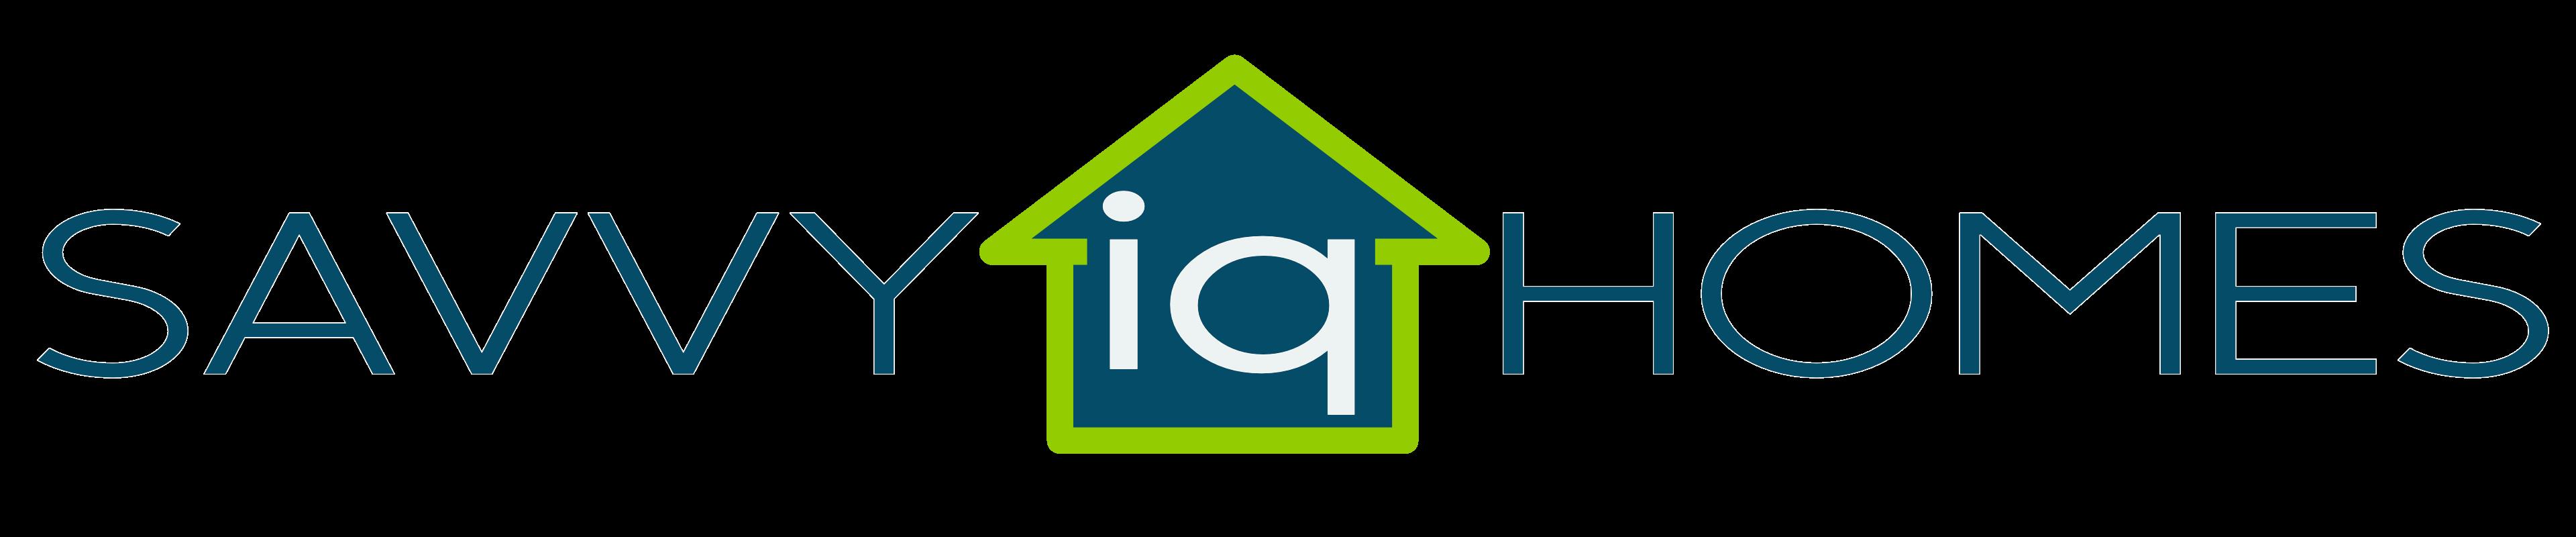 Savvy IQ Homes